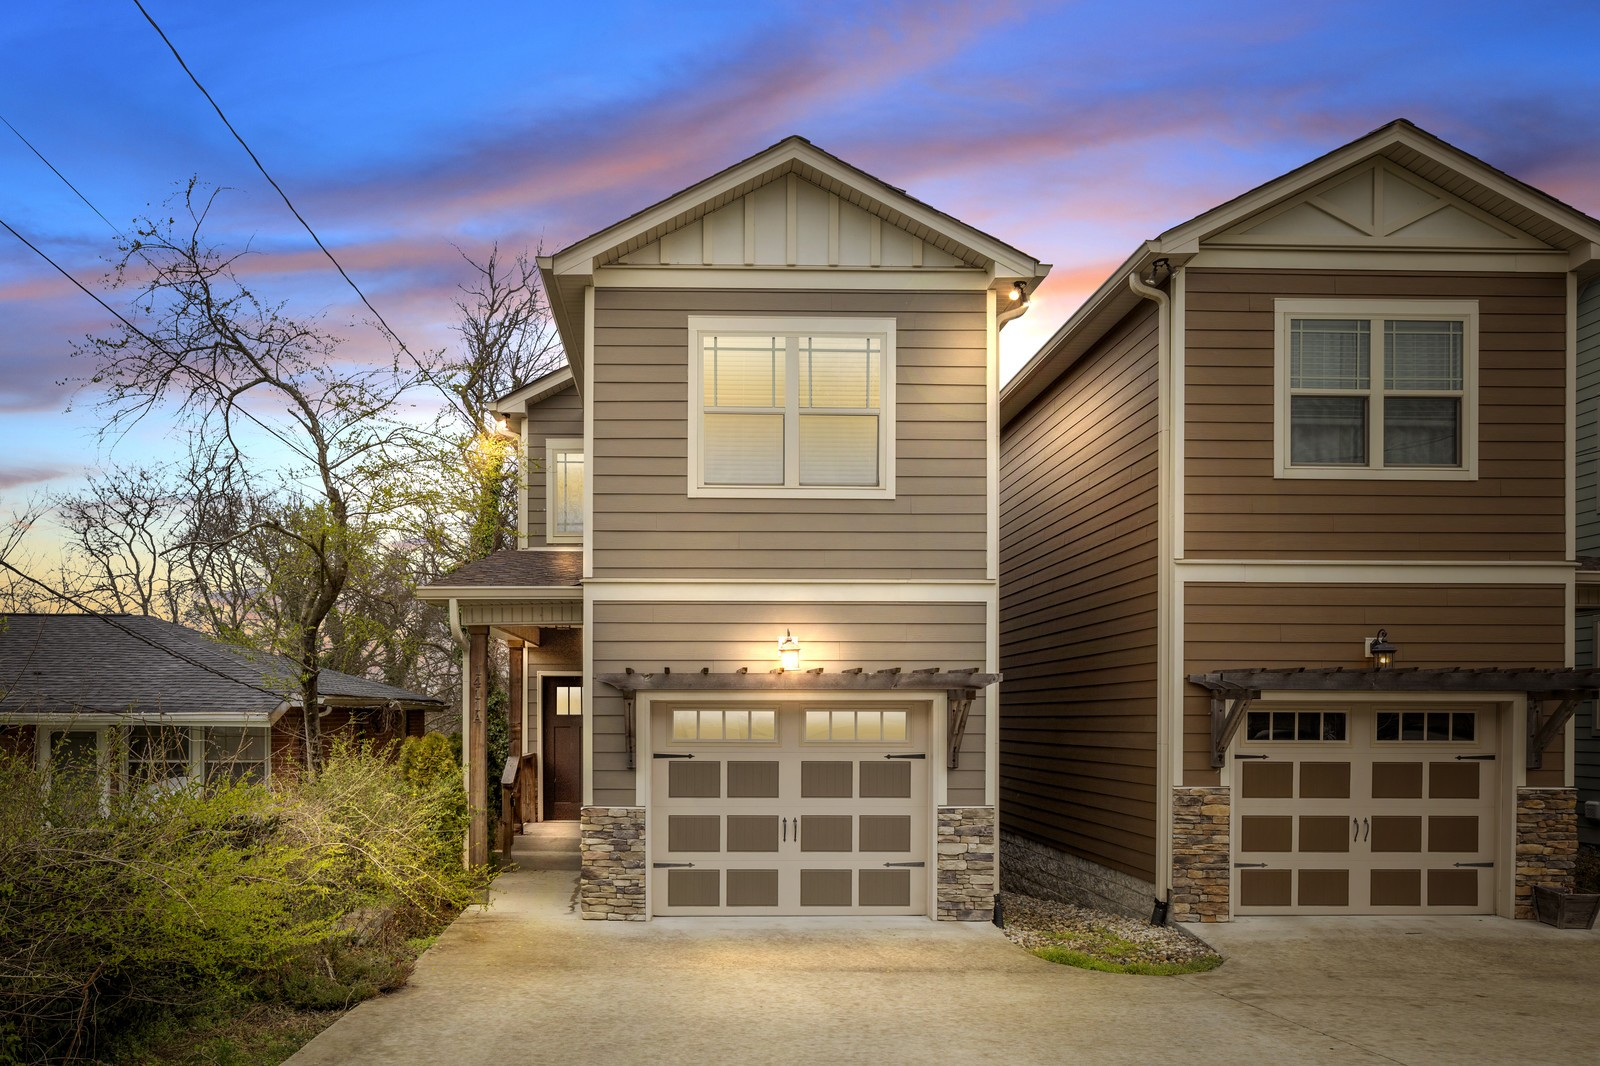 1411A Monetta Ave, Nashville, TN 37216 - Nashville, TN real estate listing